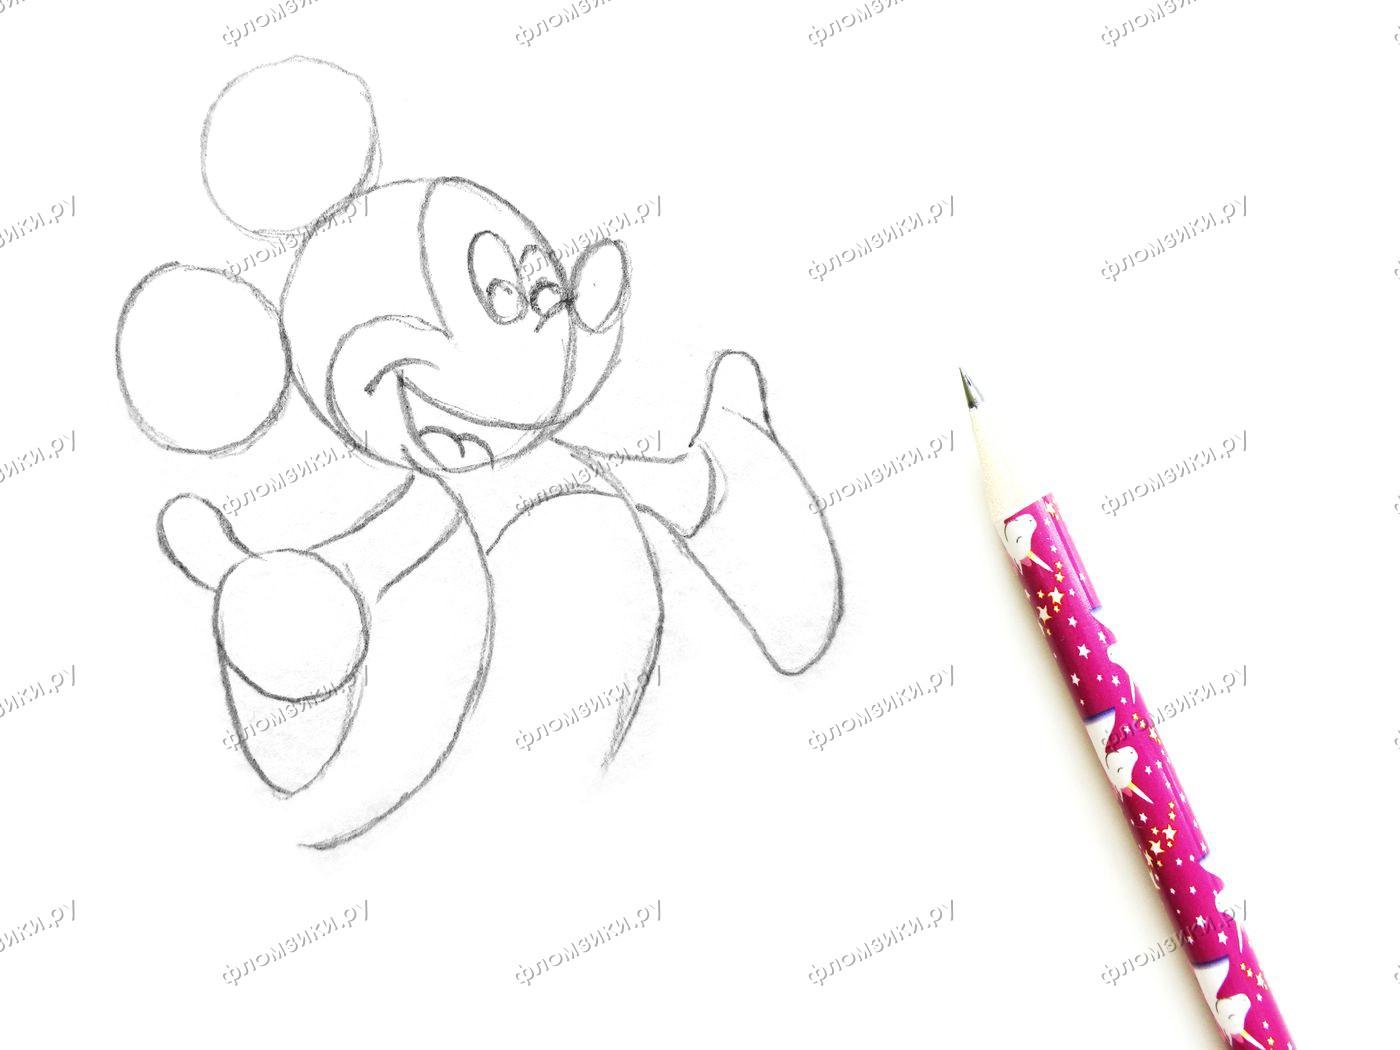 Как нарисовать Микки Мауса